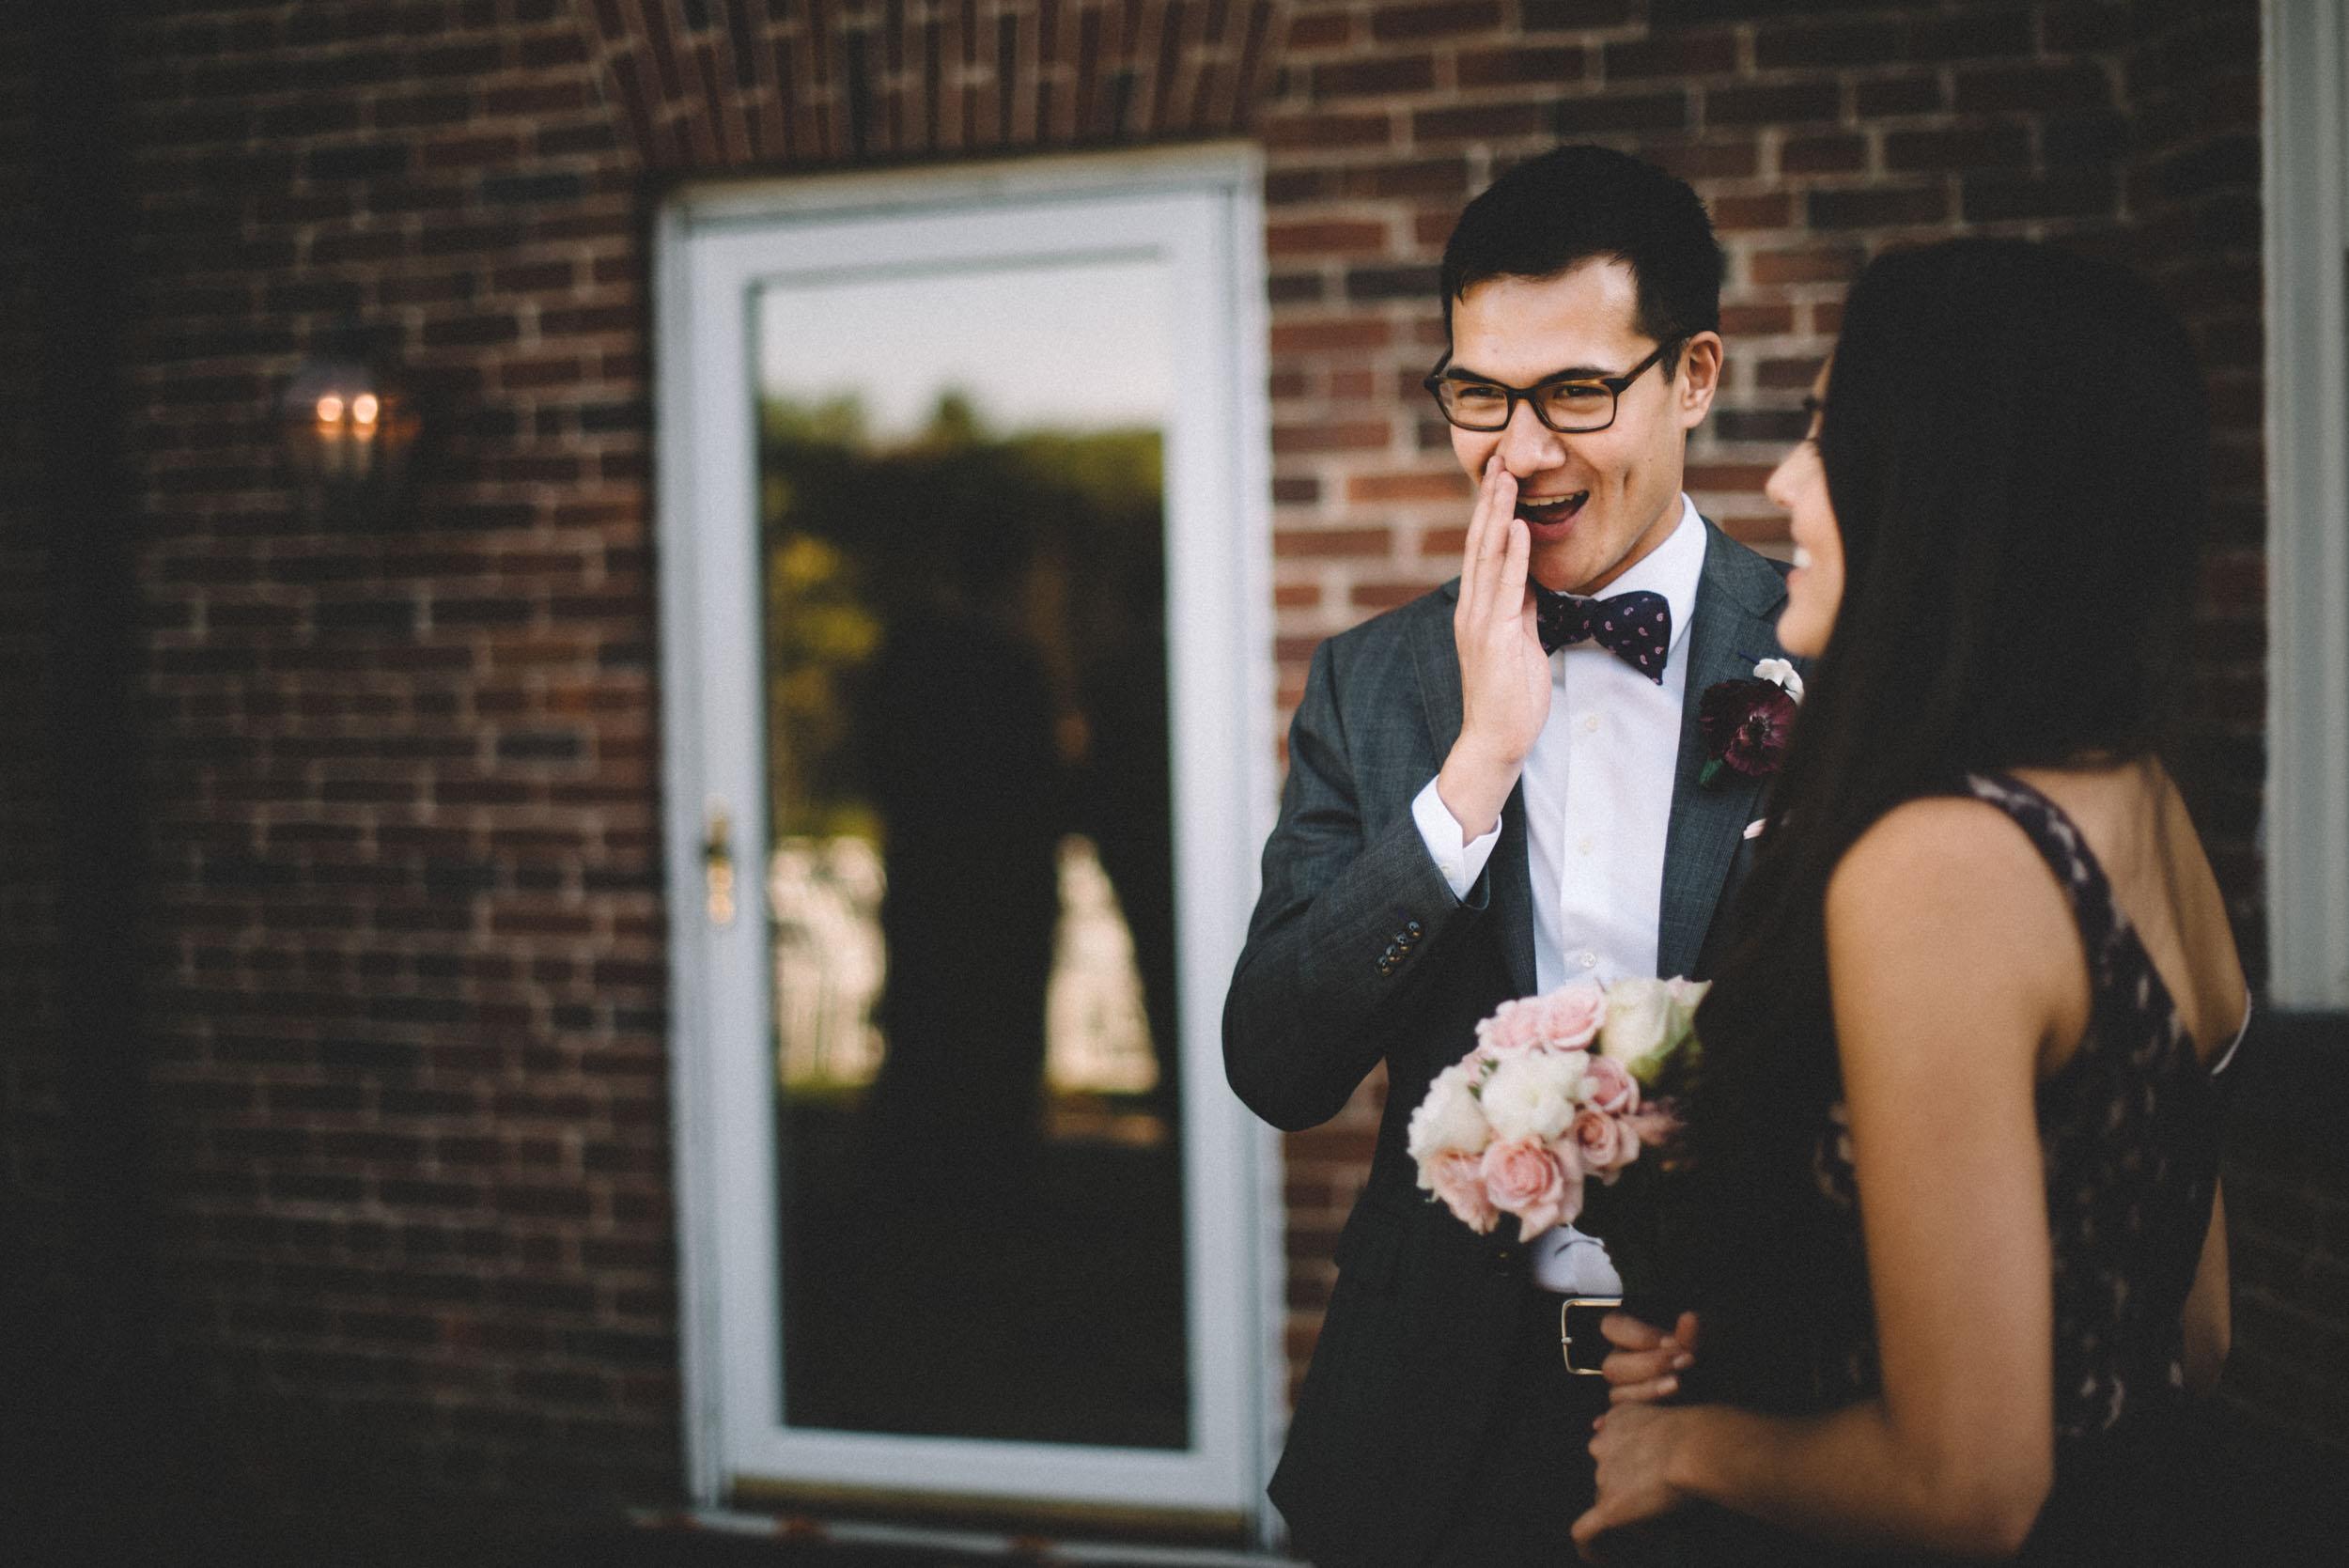 Dumbarton-House-wedding-15.jpg